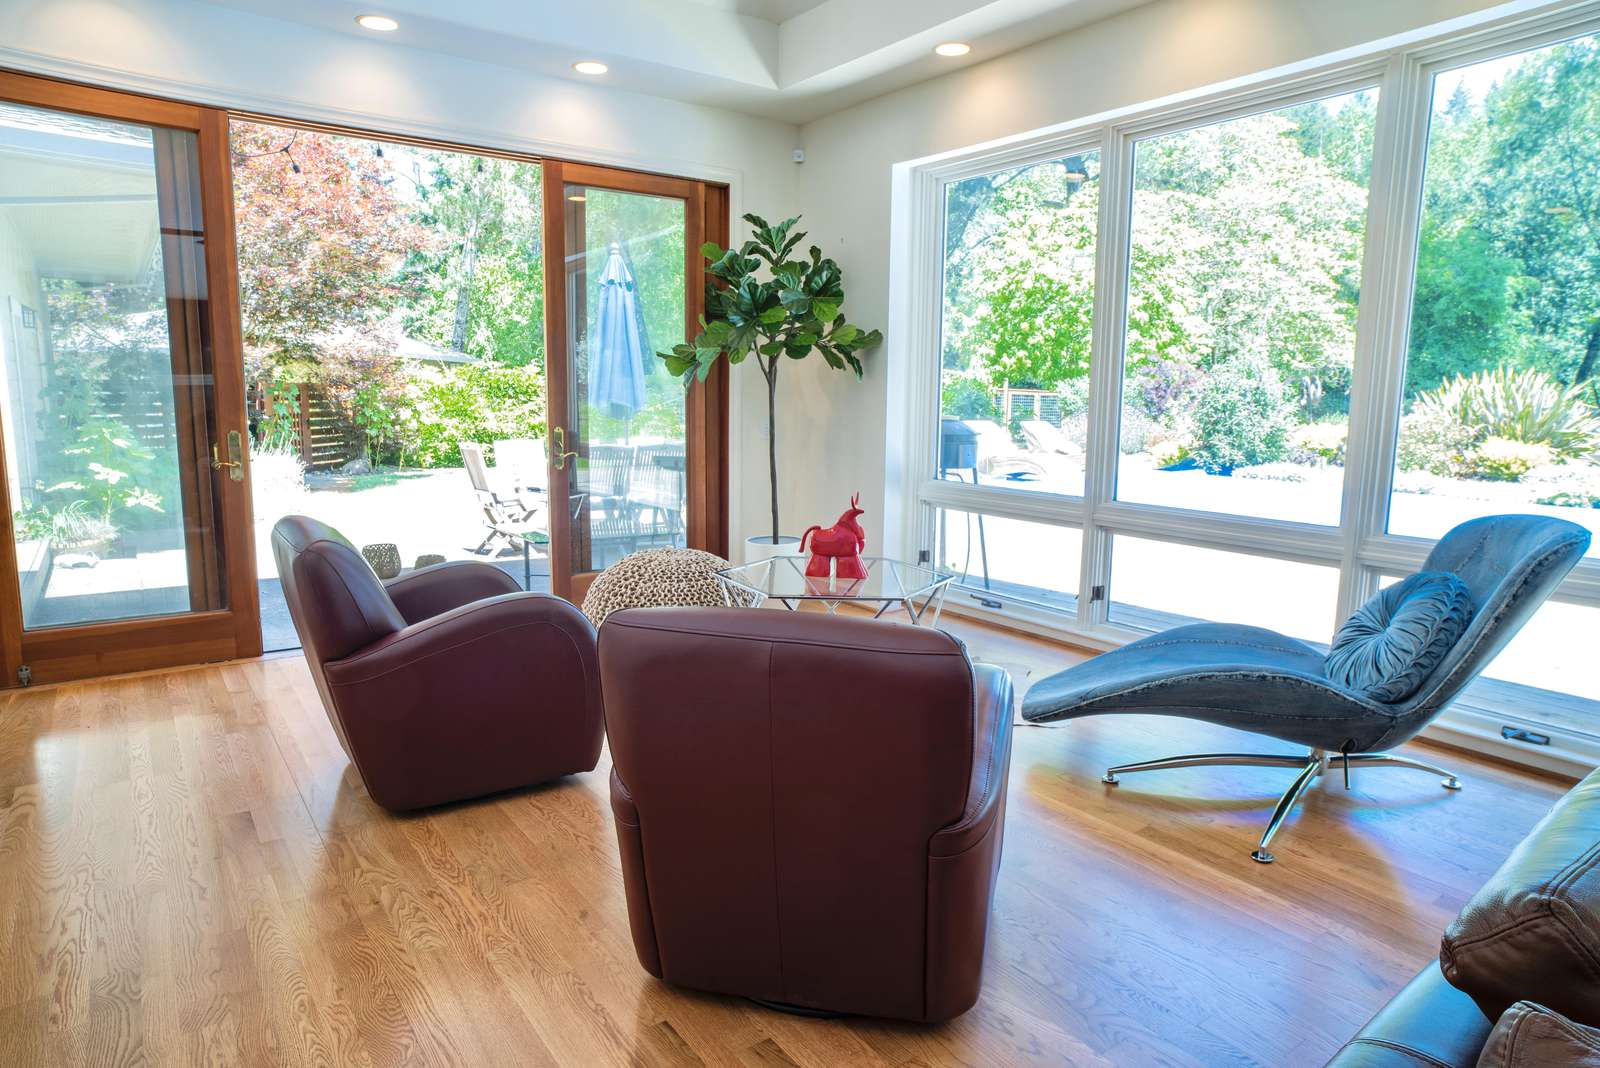 Conversation area of living room overlooking pool